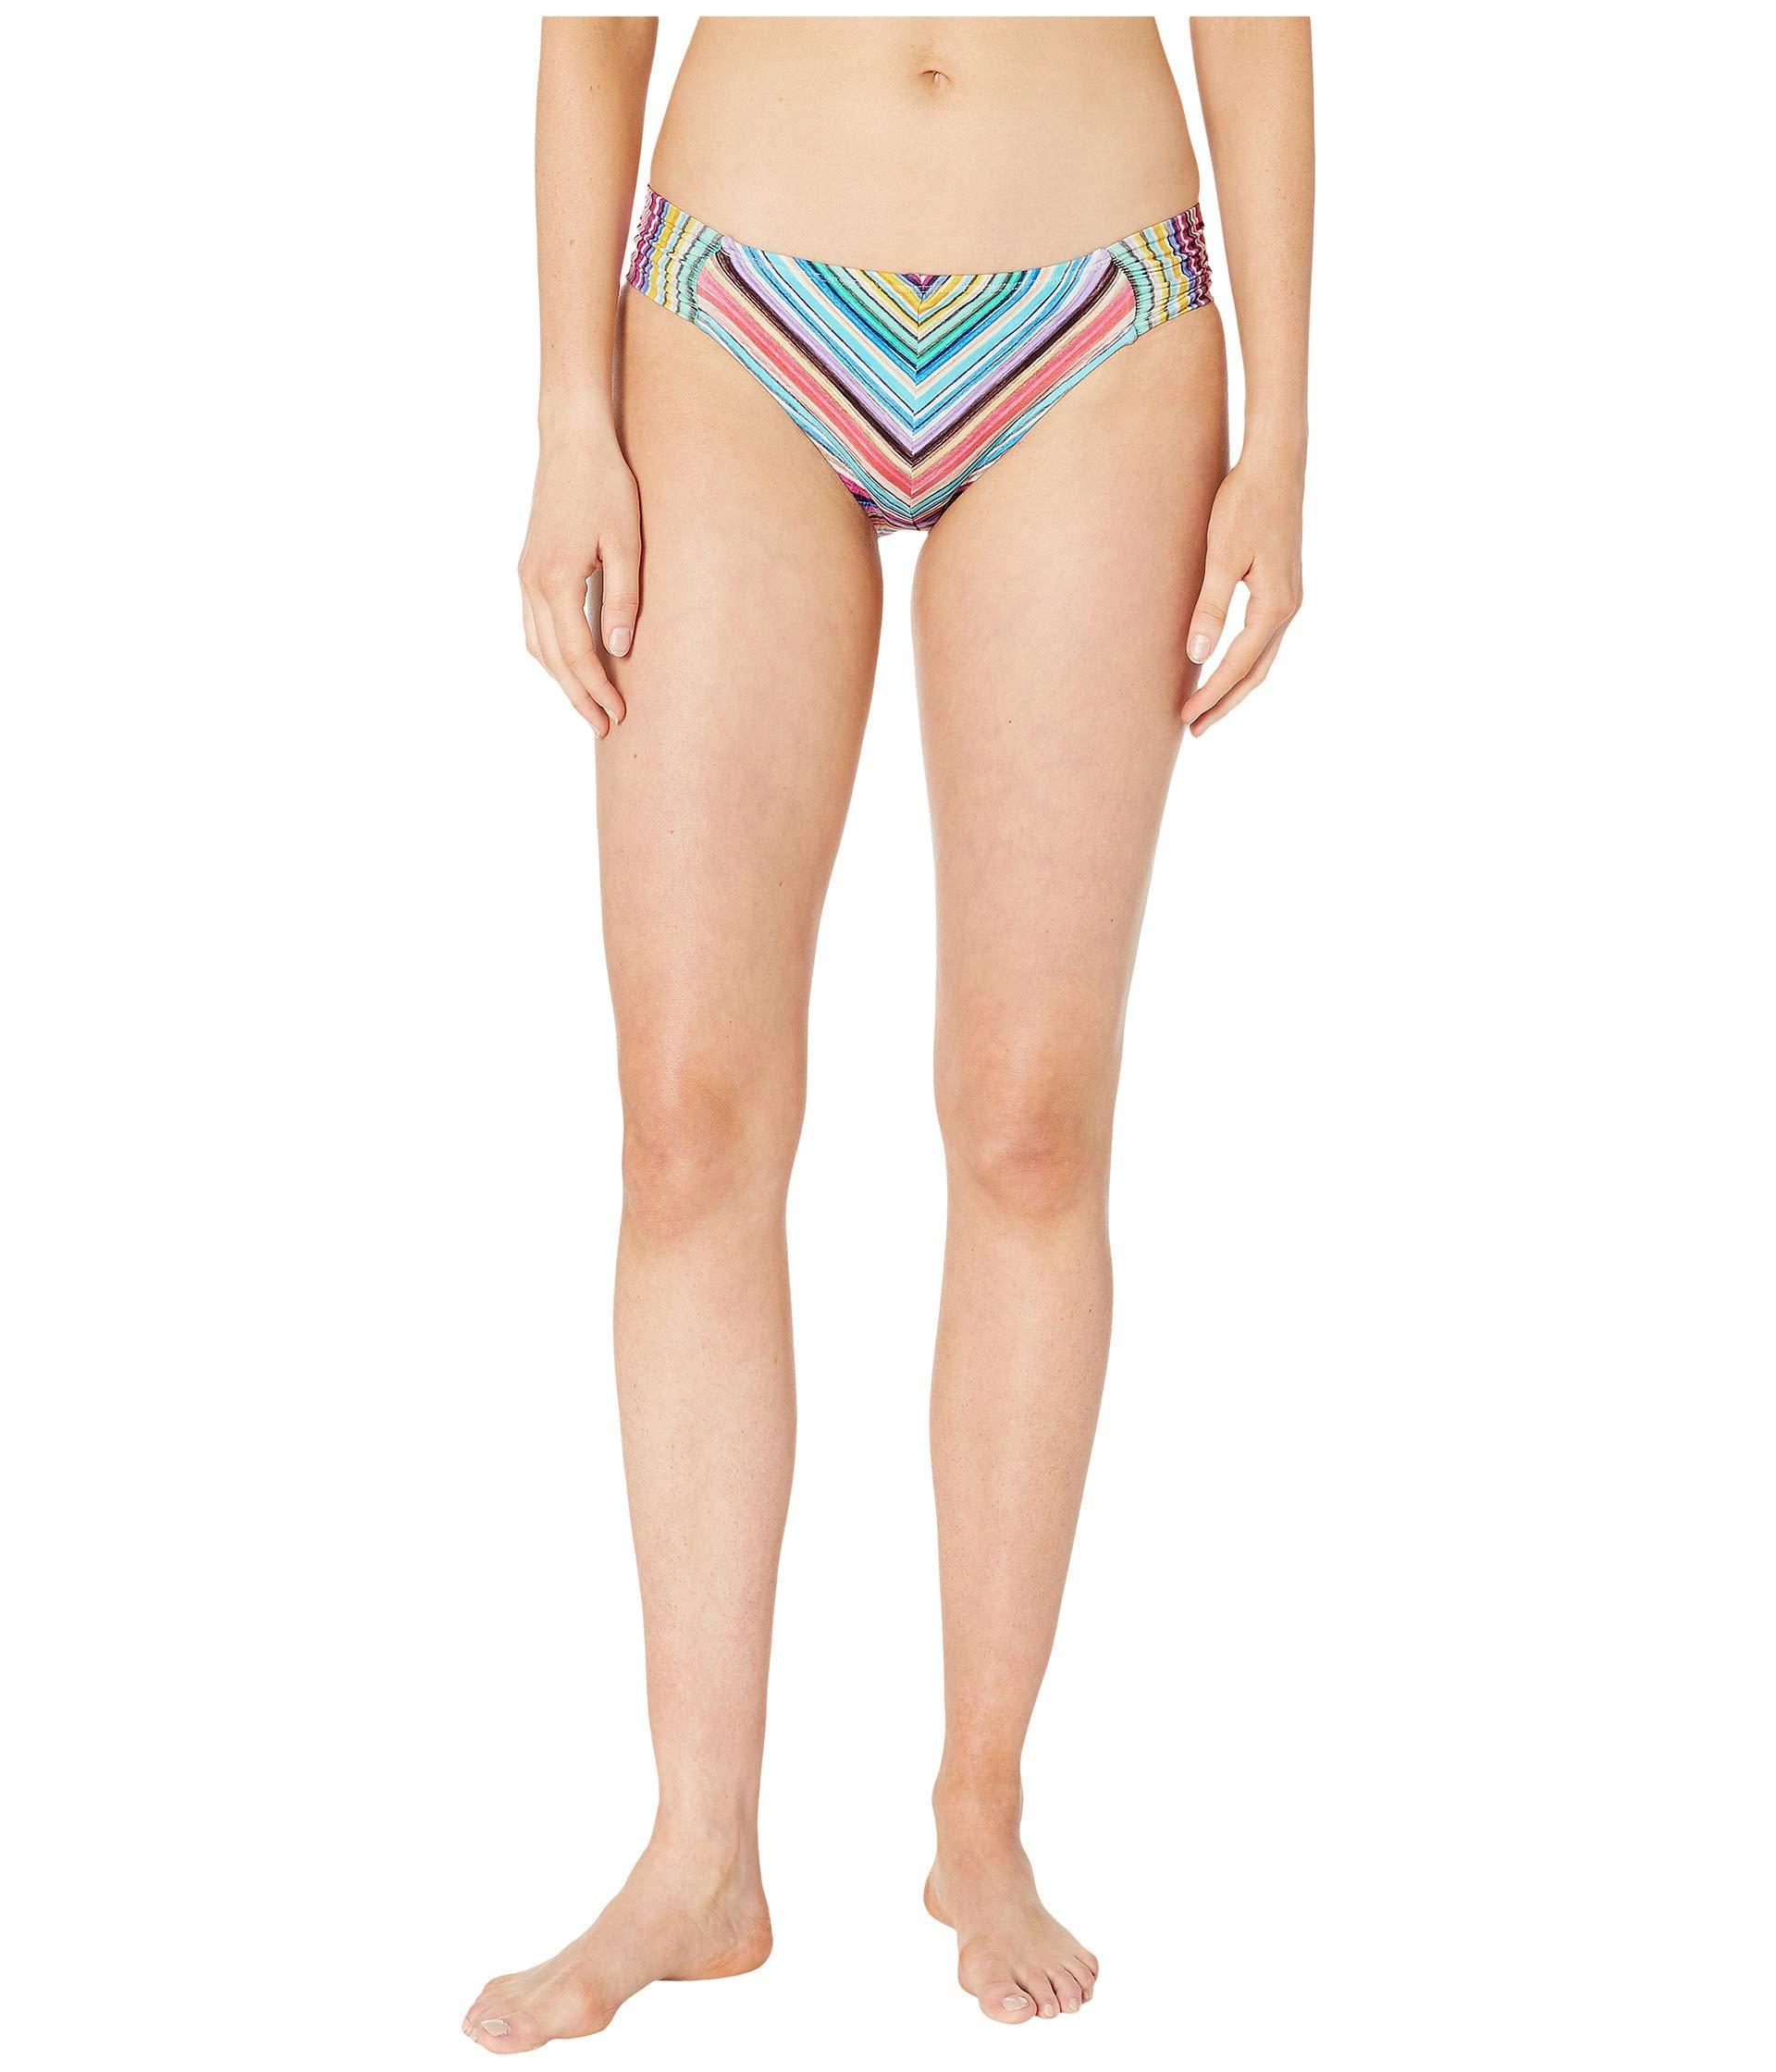 4645ba99bfa La Blanca. Blue Tahitian Stripe Mitered Side Shirred Hipster Bottoms  (multi) Women s Swimwear